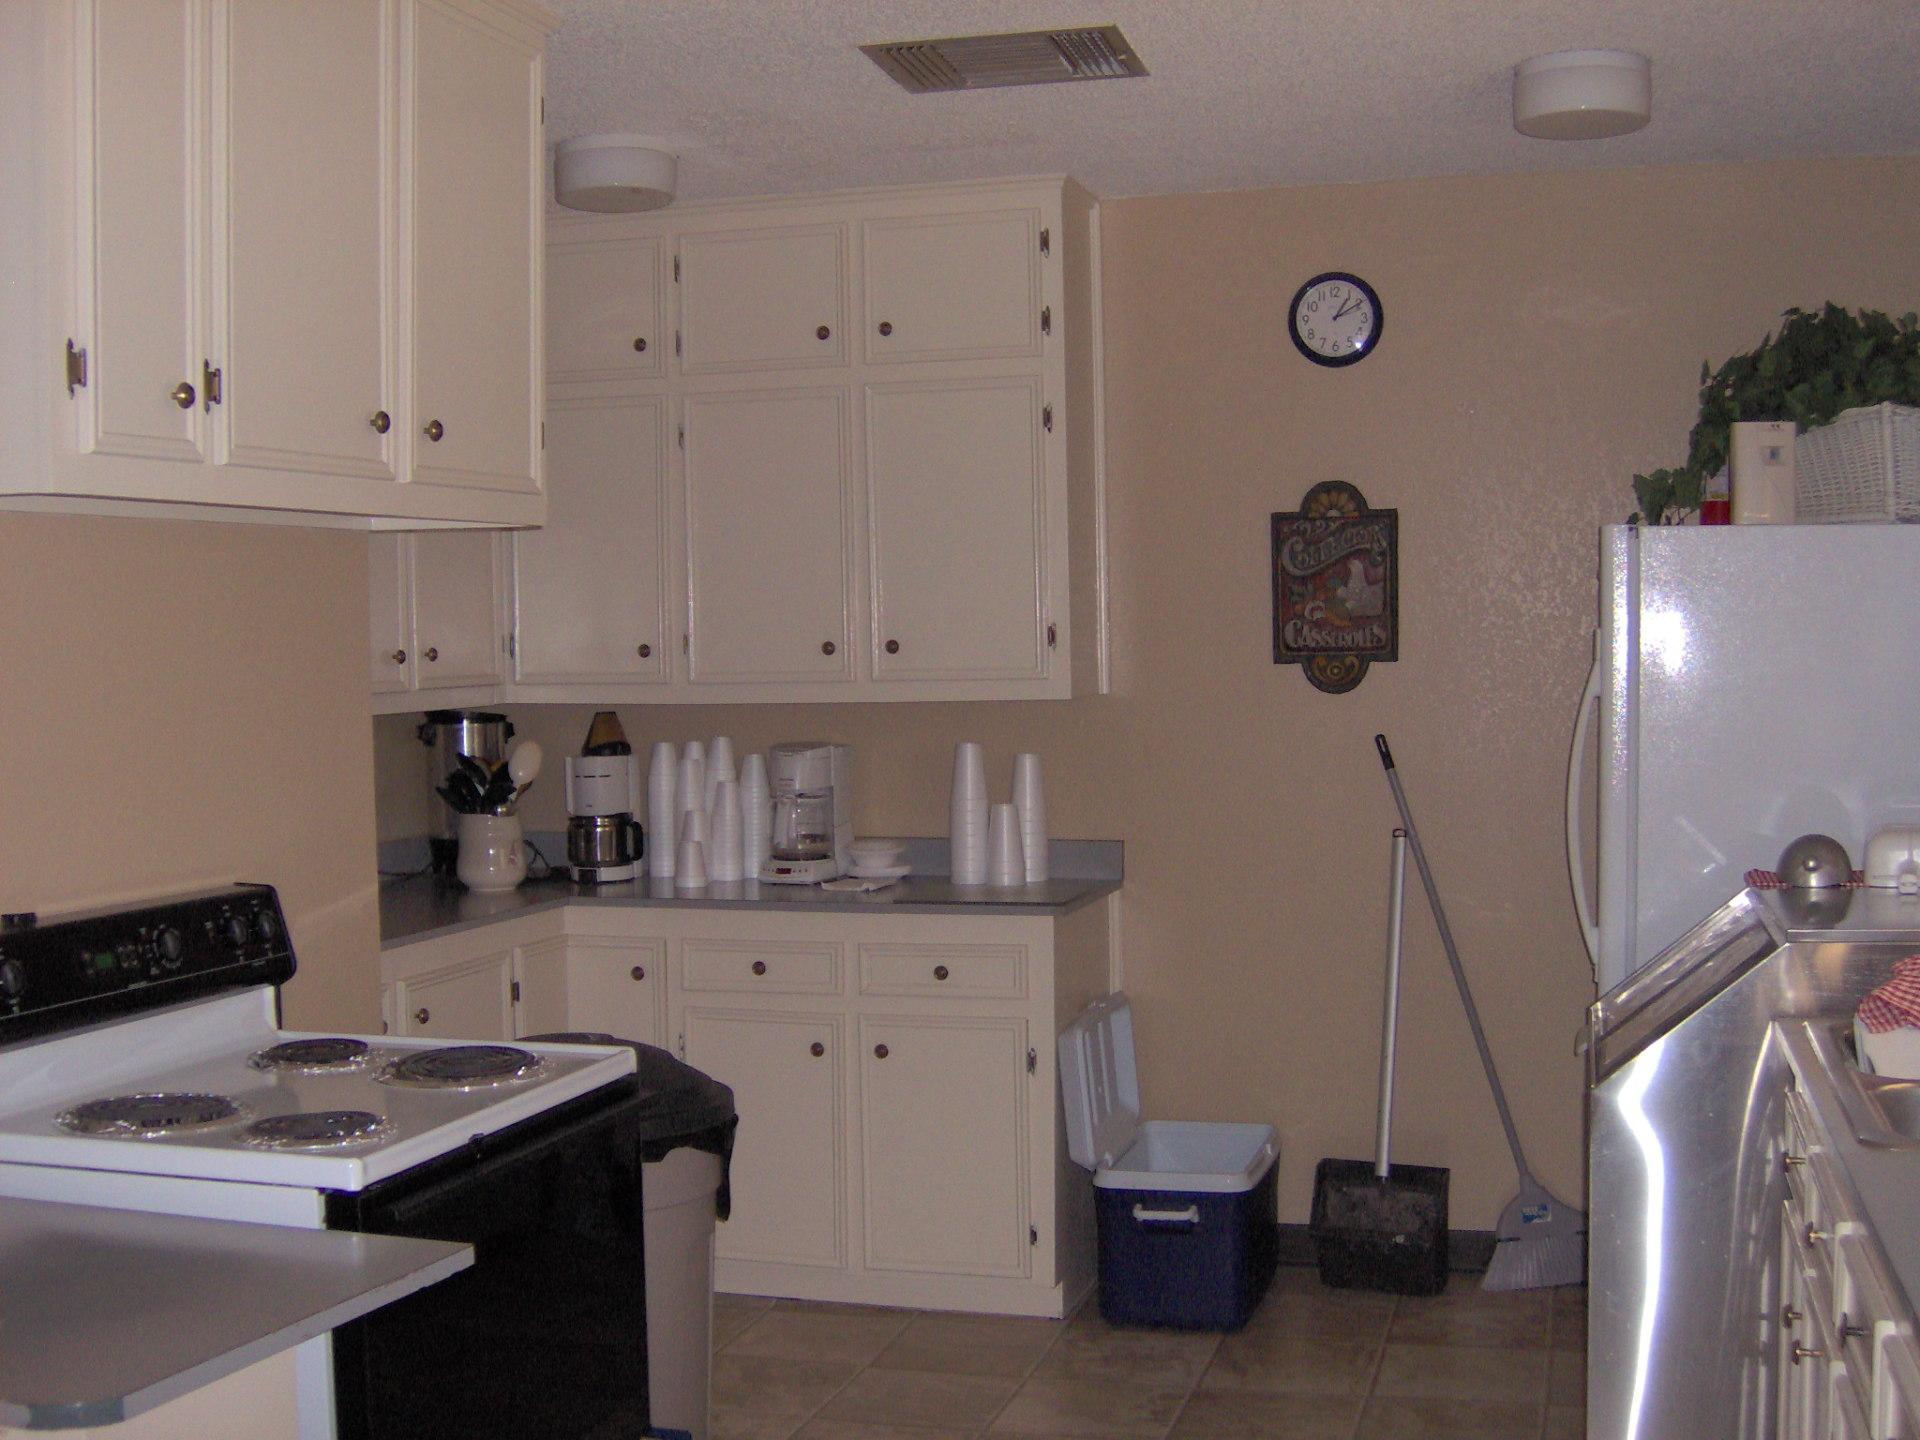 Kitchen in dormitory